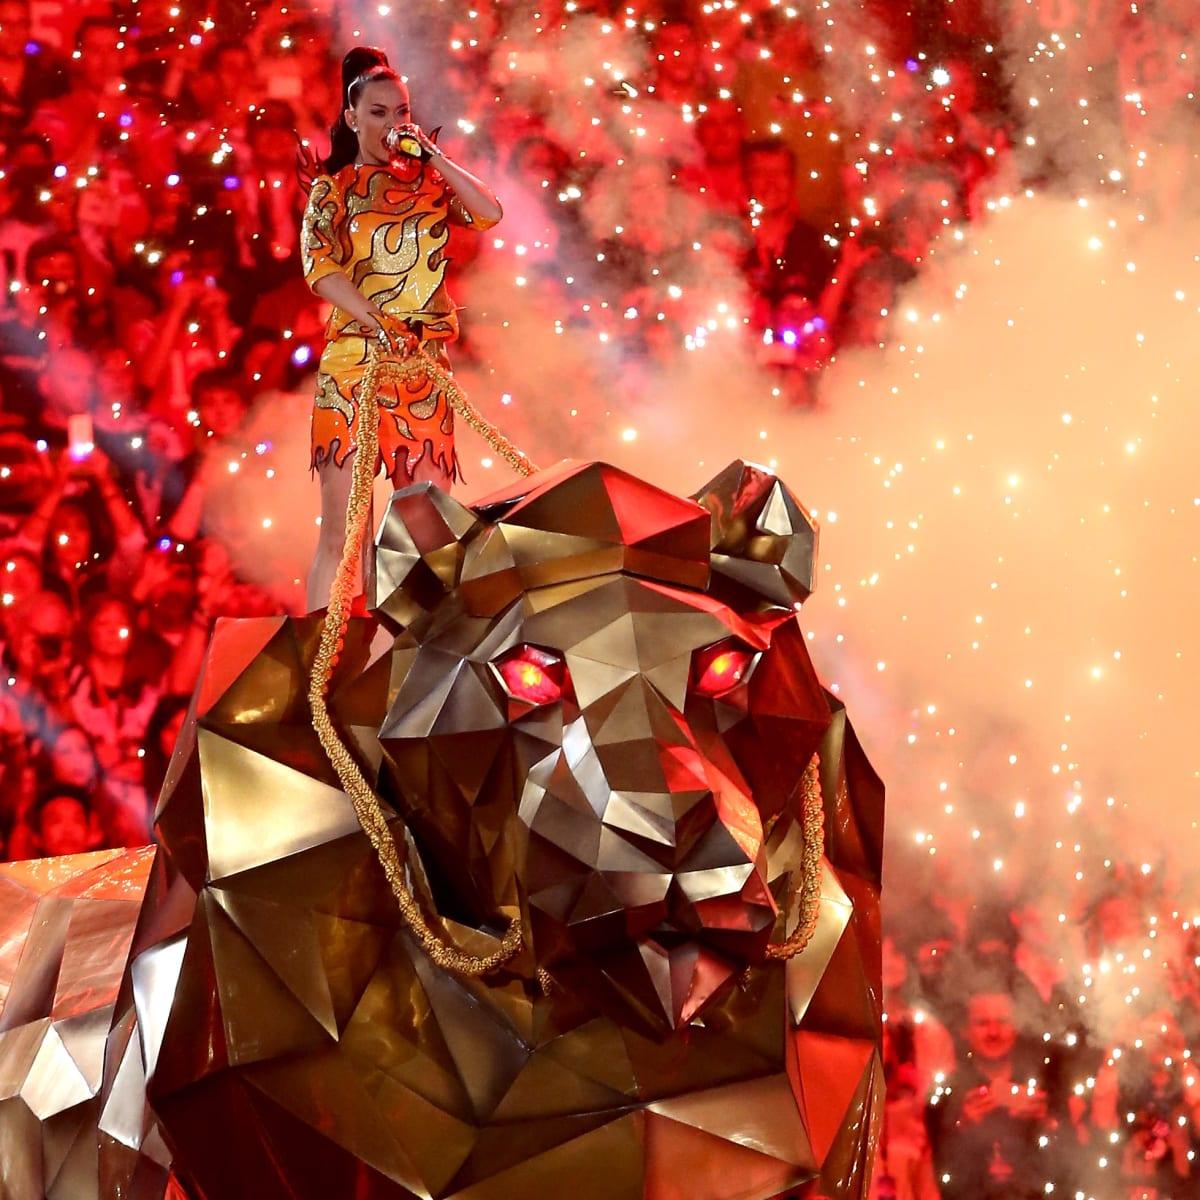 katy-perry-robot-lion-super-bowl-2015-ha